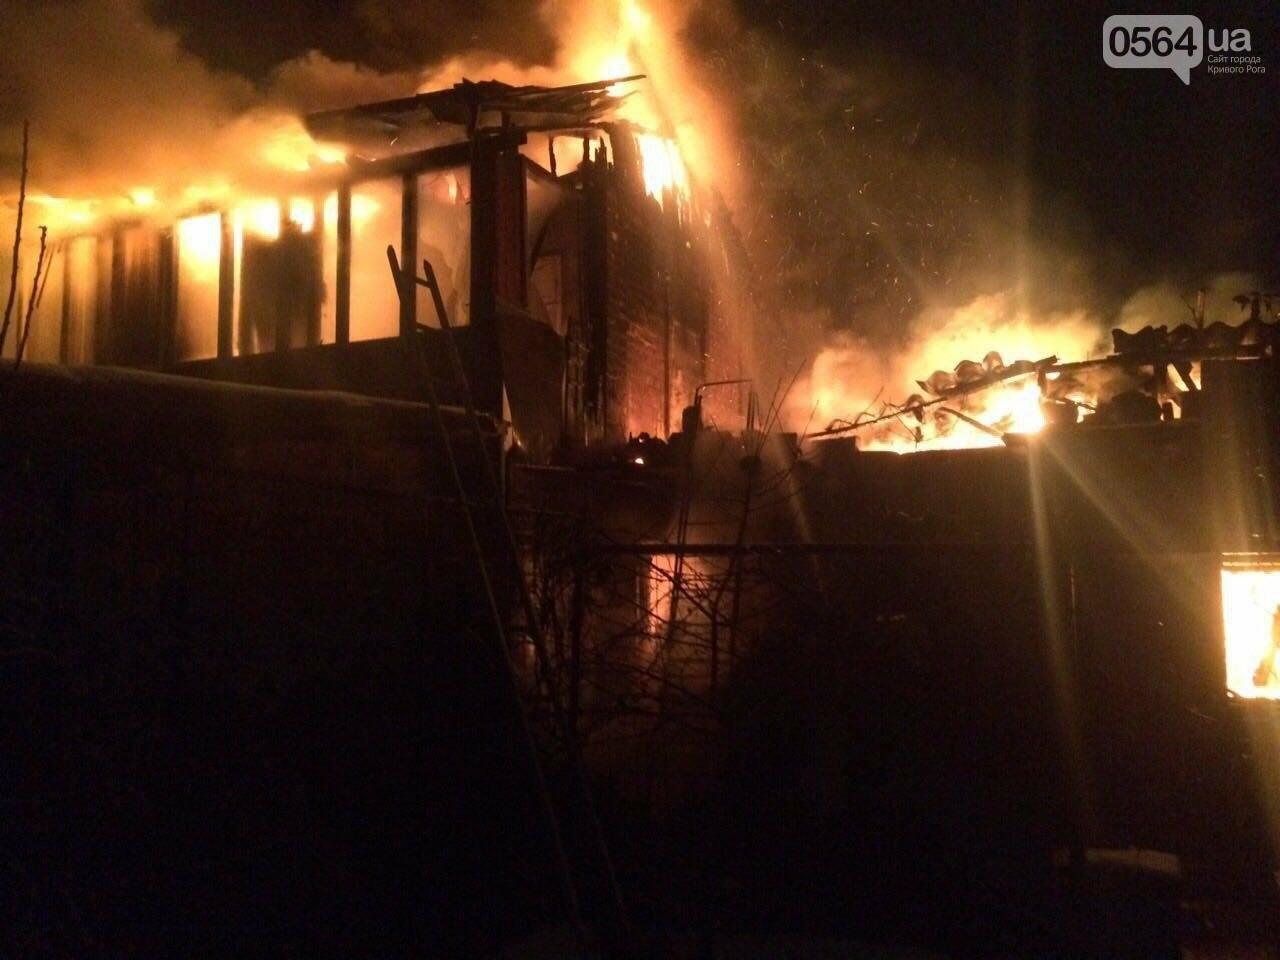 Криворожане лишилась части дома  из-за масштабного пожара, - ФОТО , фото-2